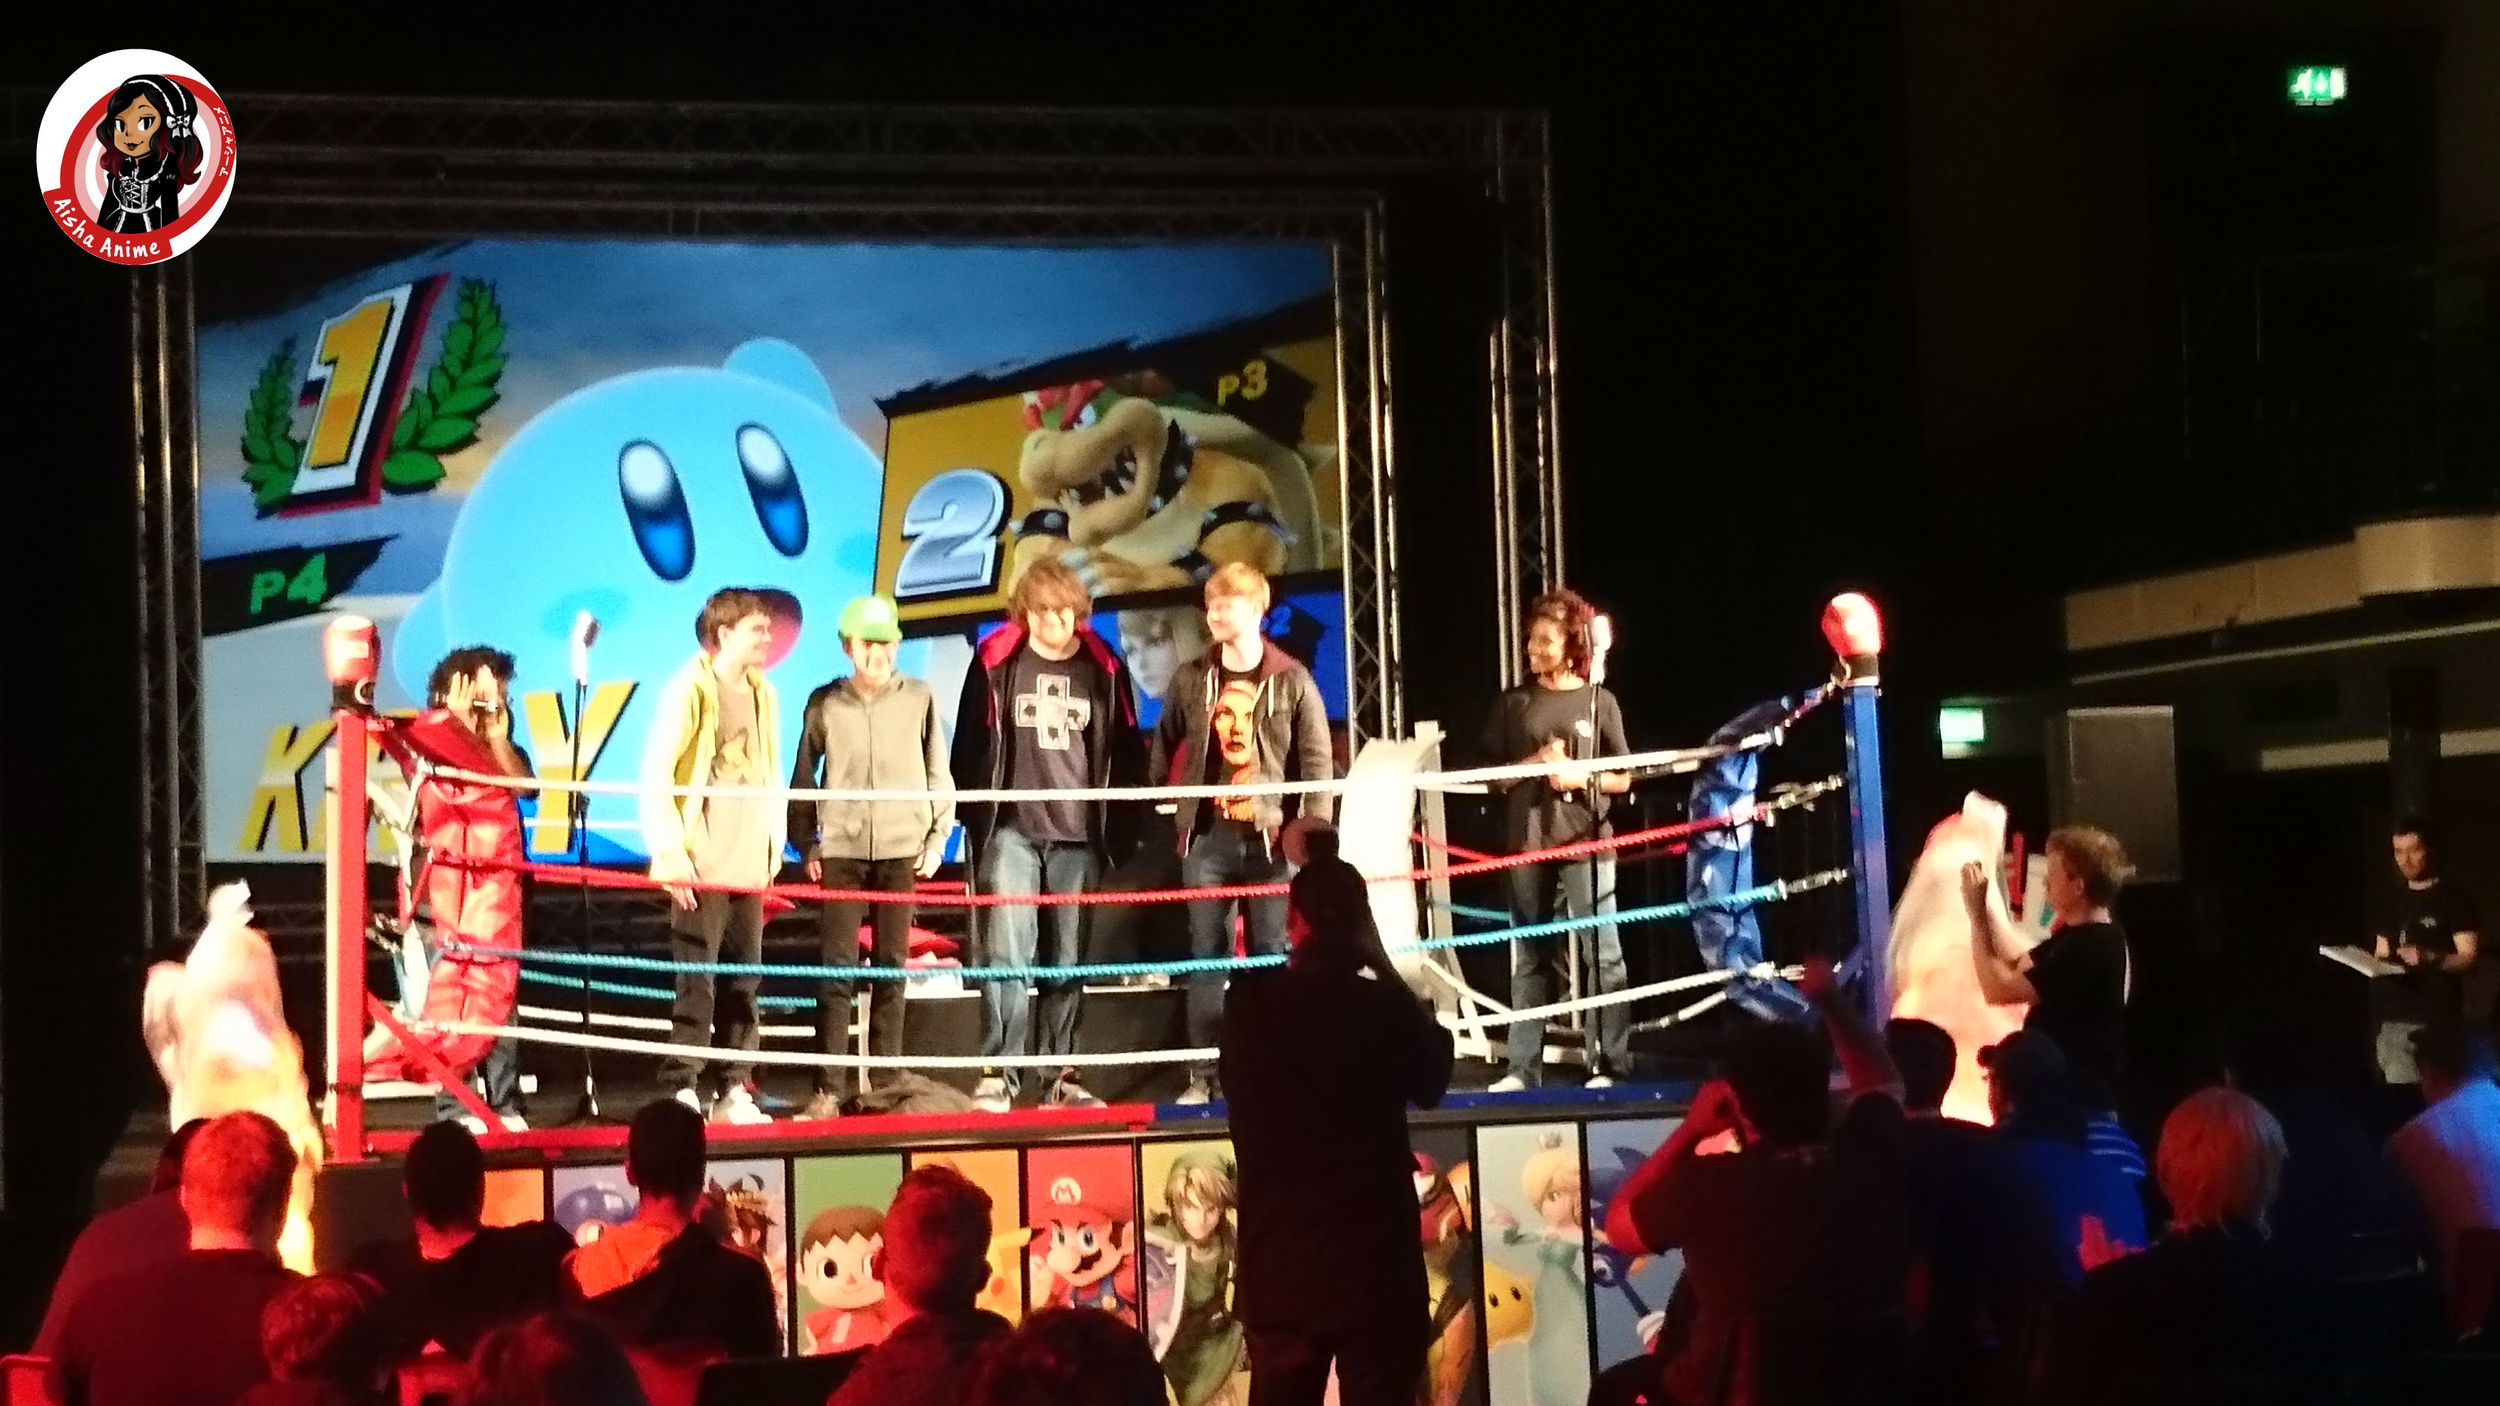 boxing ring smash